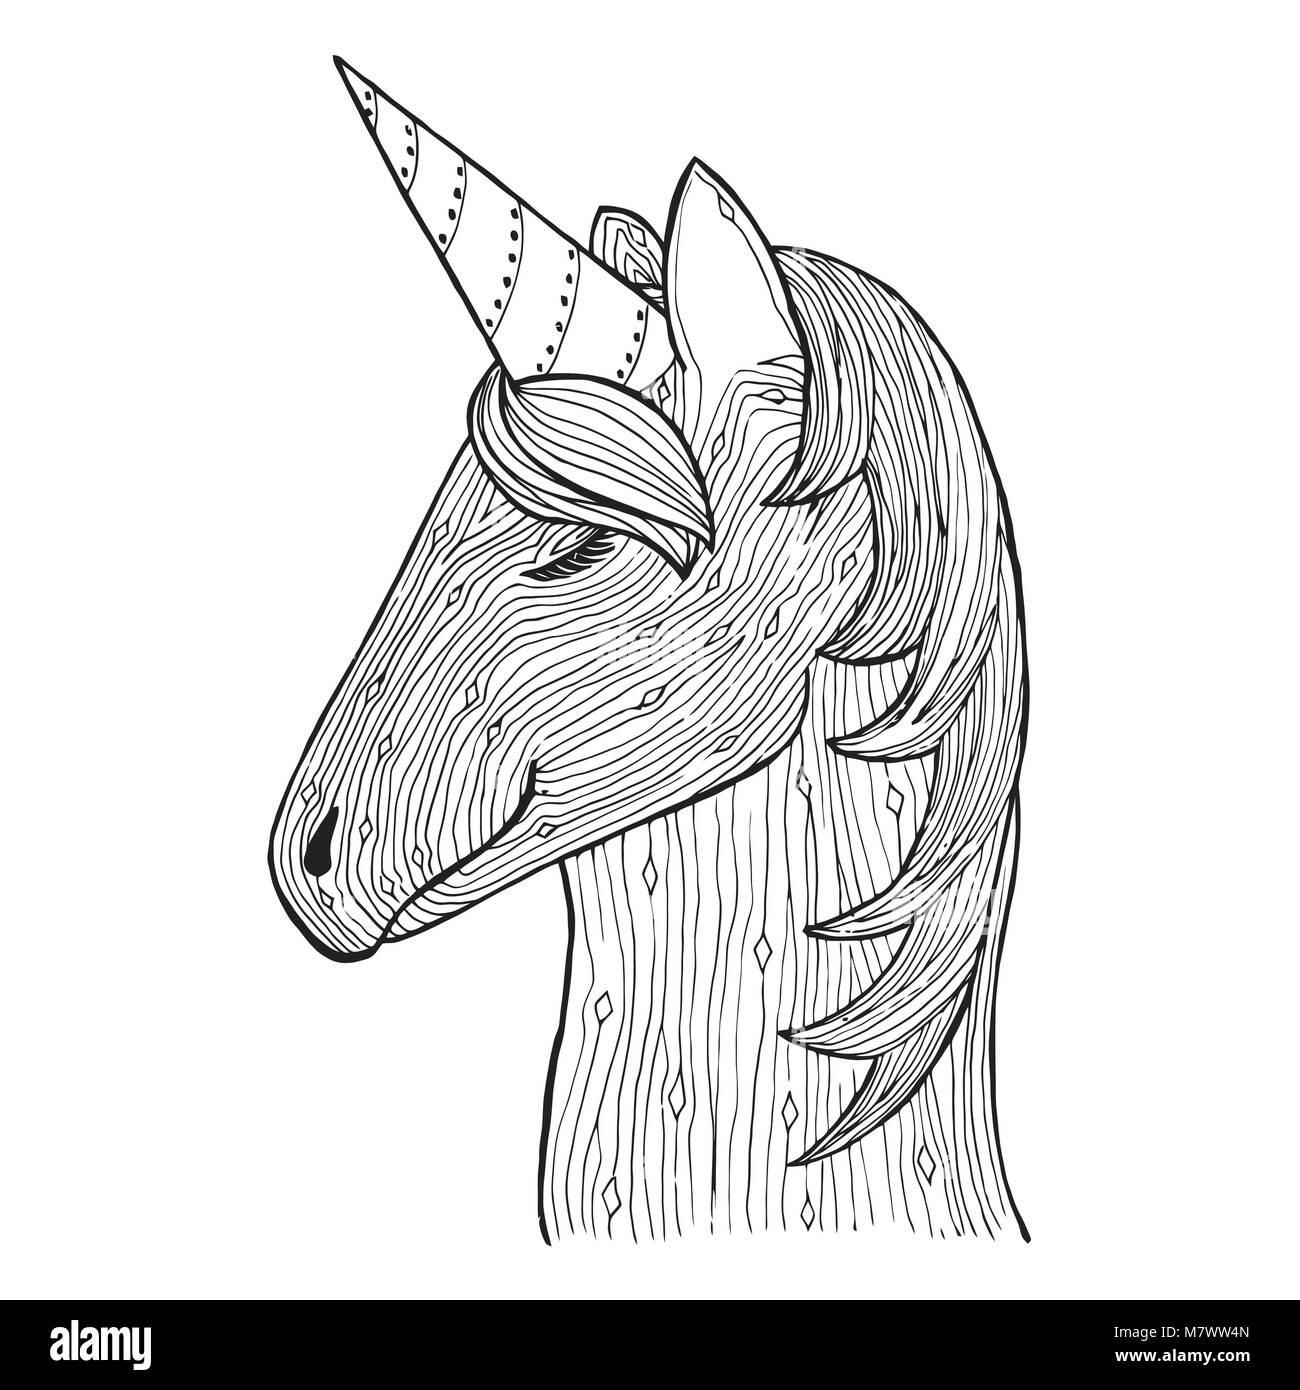 Atractivo Unicornio Miserable Para Colorear Bandera - Dibujos Para ...